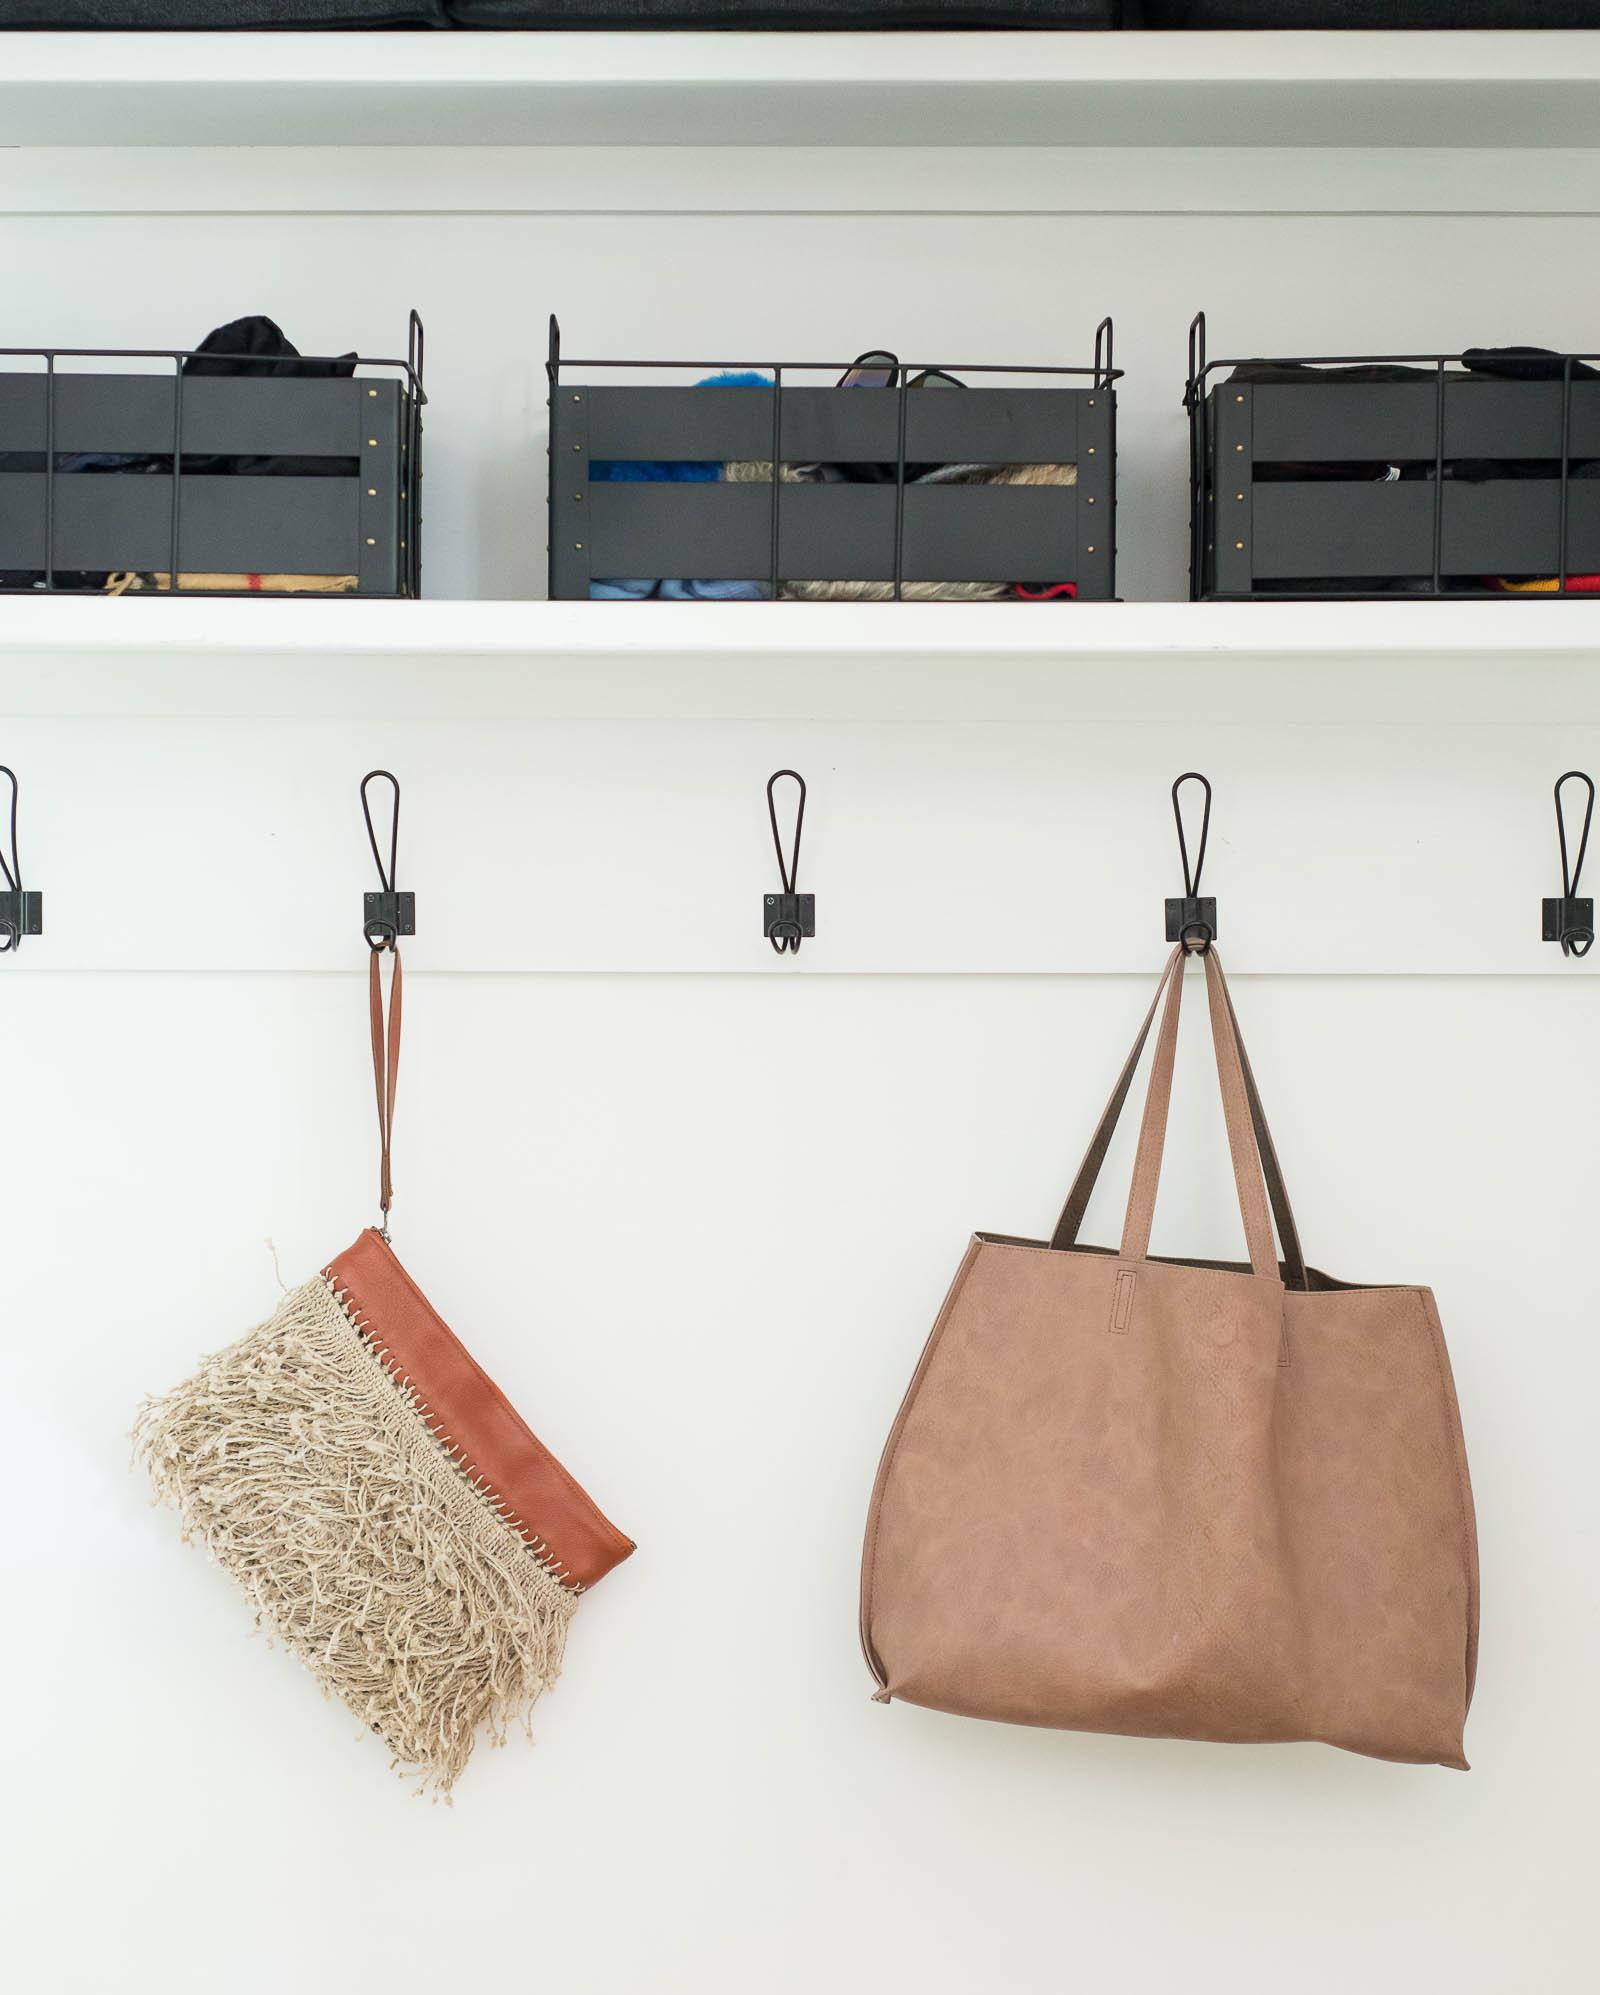 Coat closet organization.